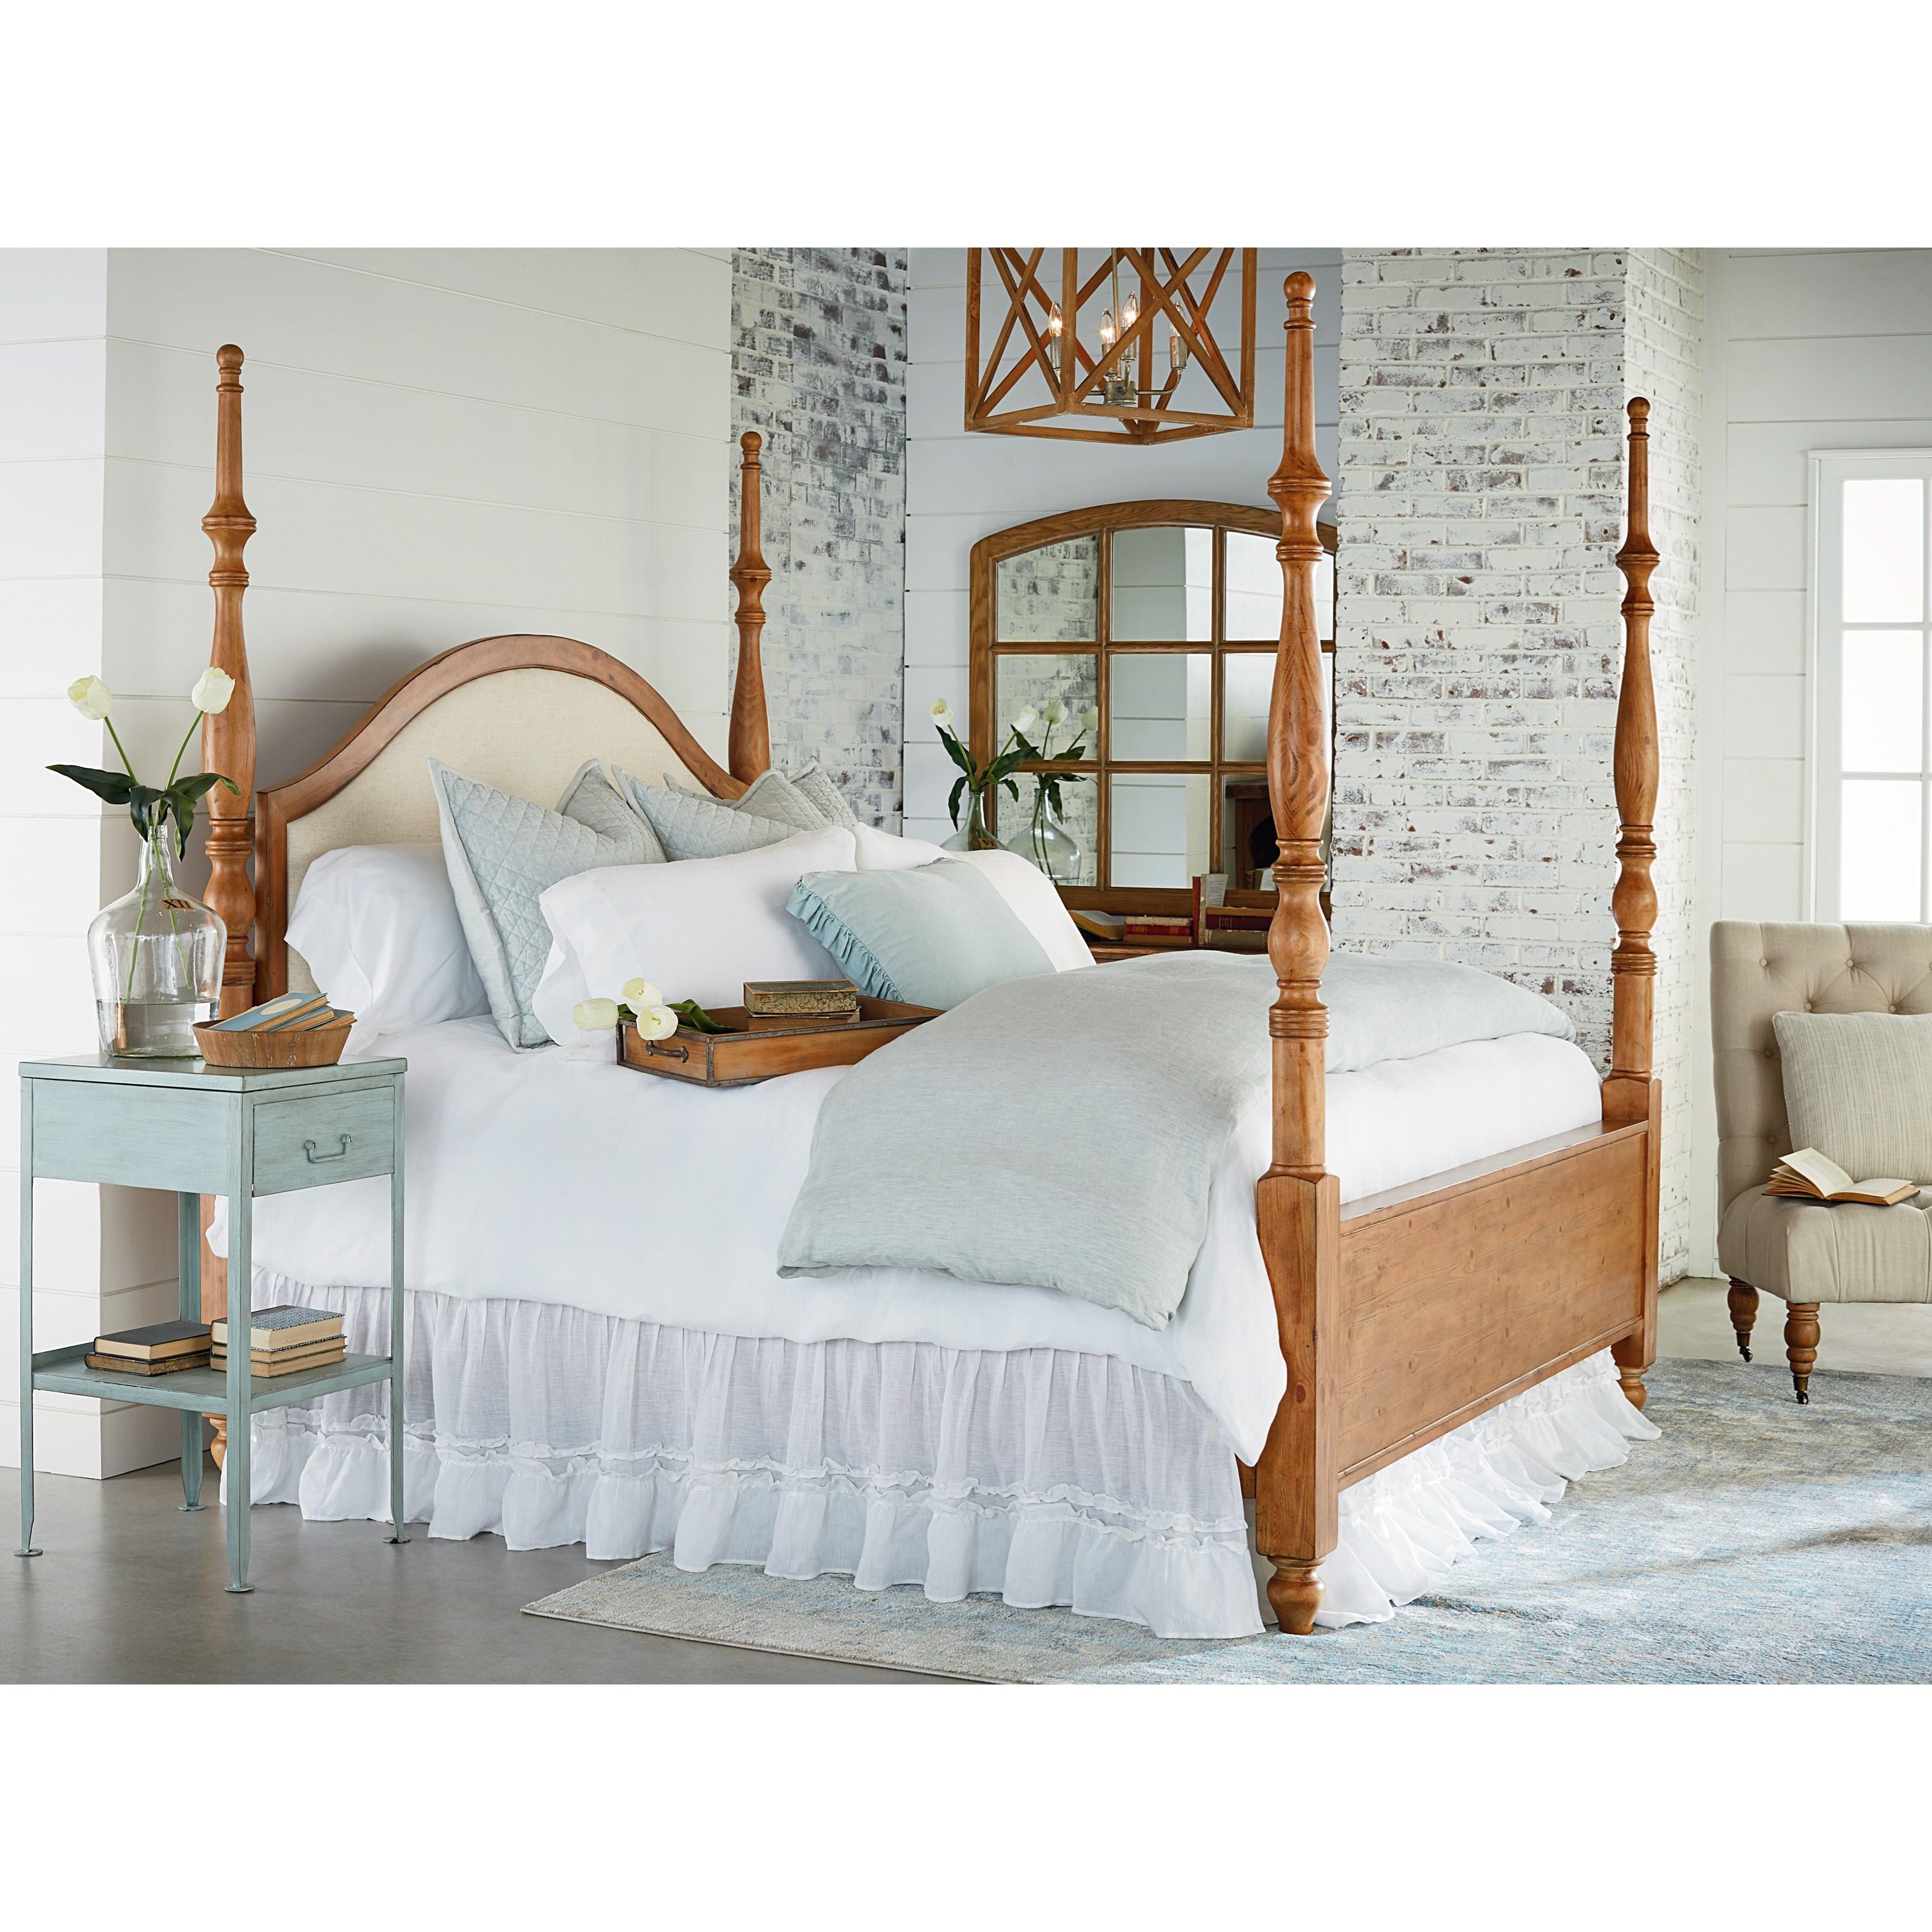 Magnolia Home By Joanna Gaines Primitive King Bedroom Group Olinde 39 S Furniture Bedroom Groups